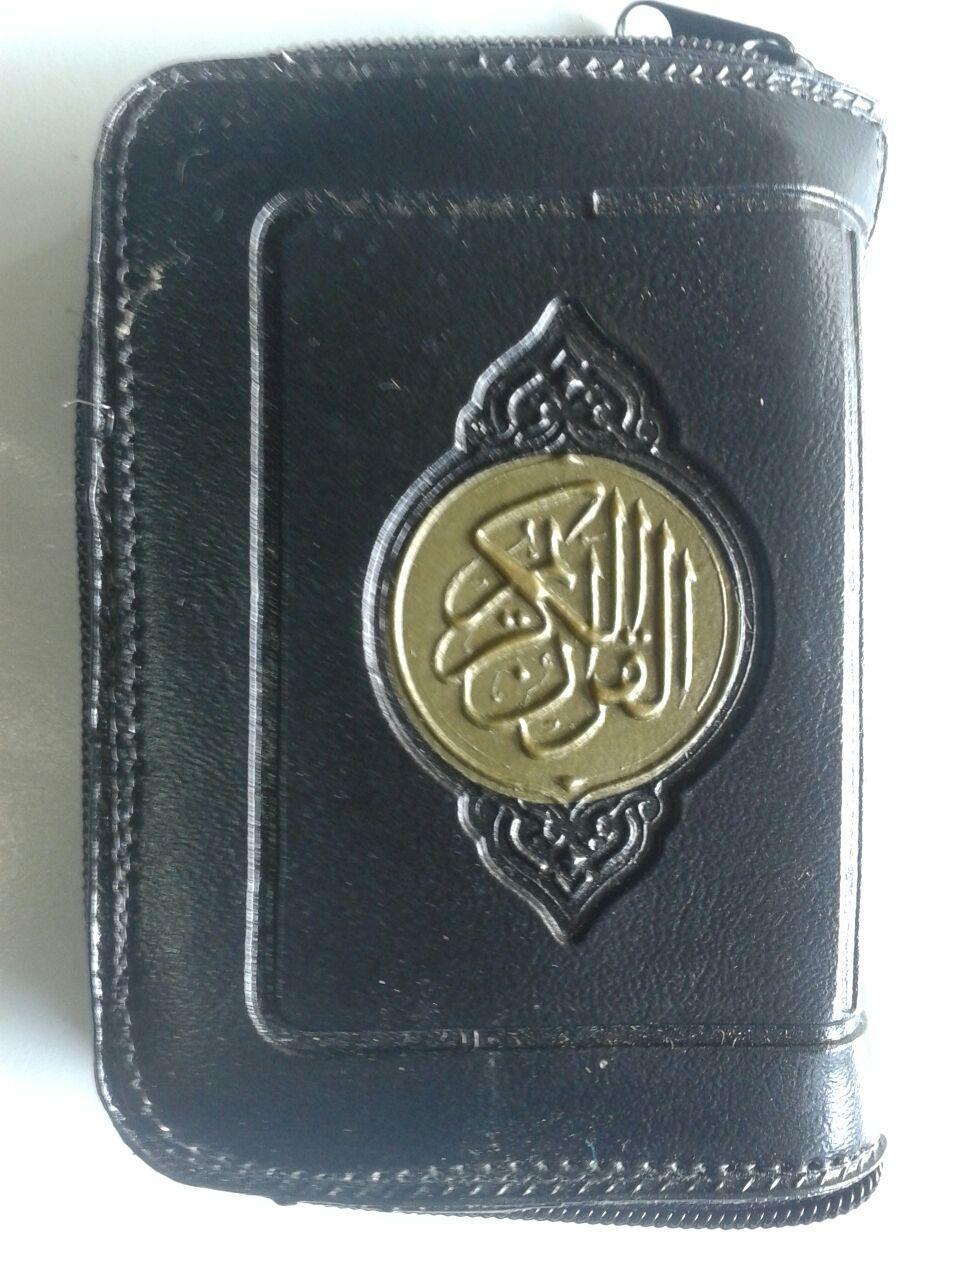 Al-Qur'an Impor Ukuran Saku Kecil 5x7 Resleting cover